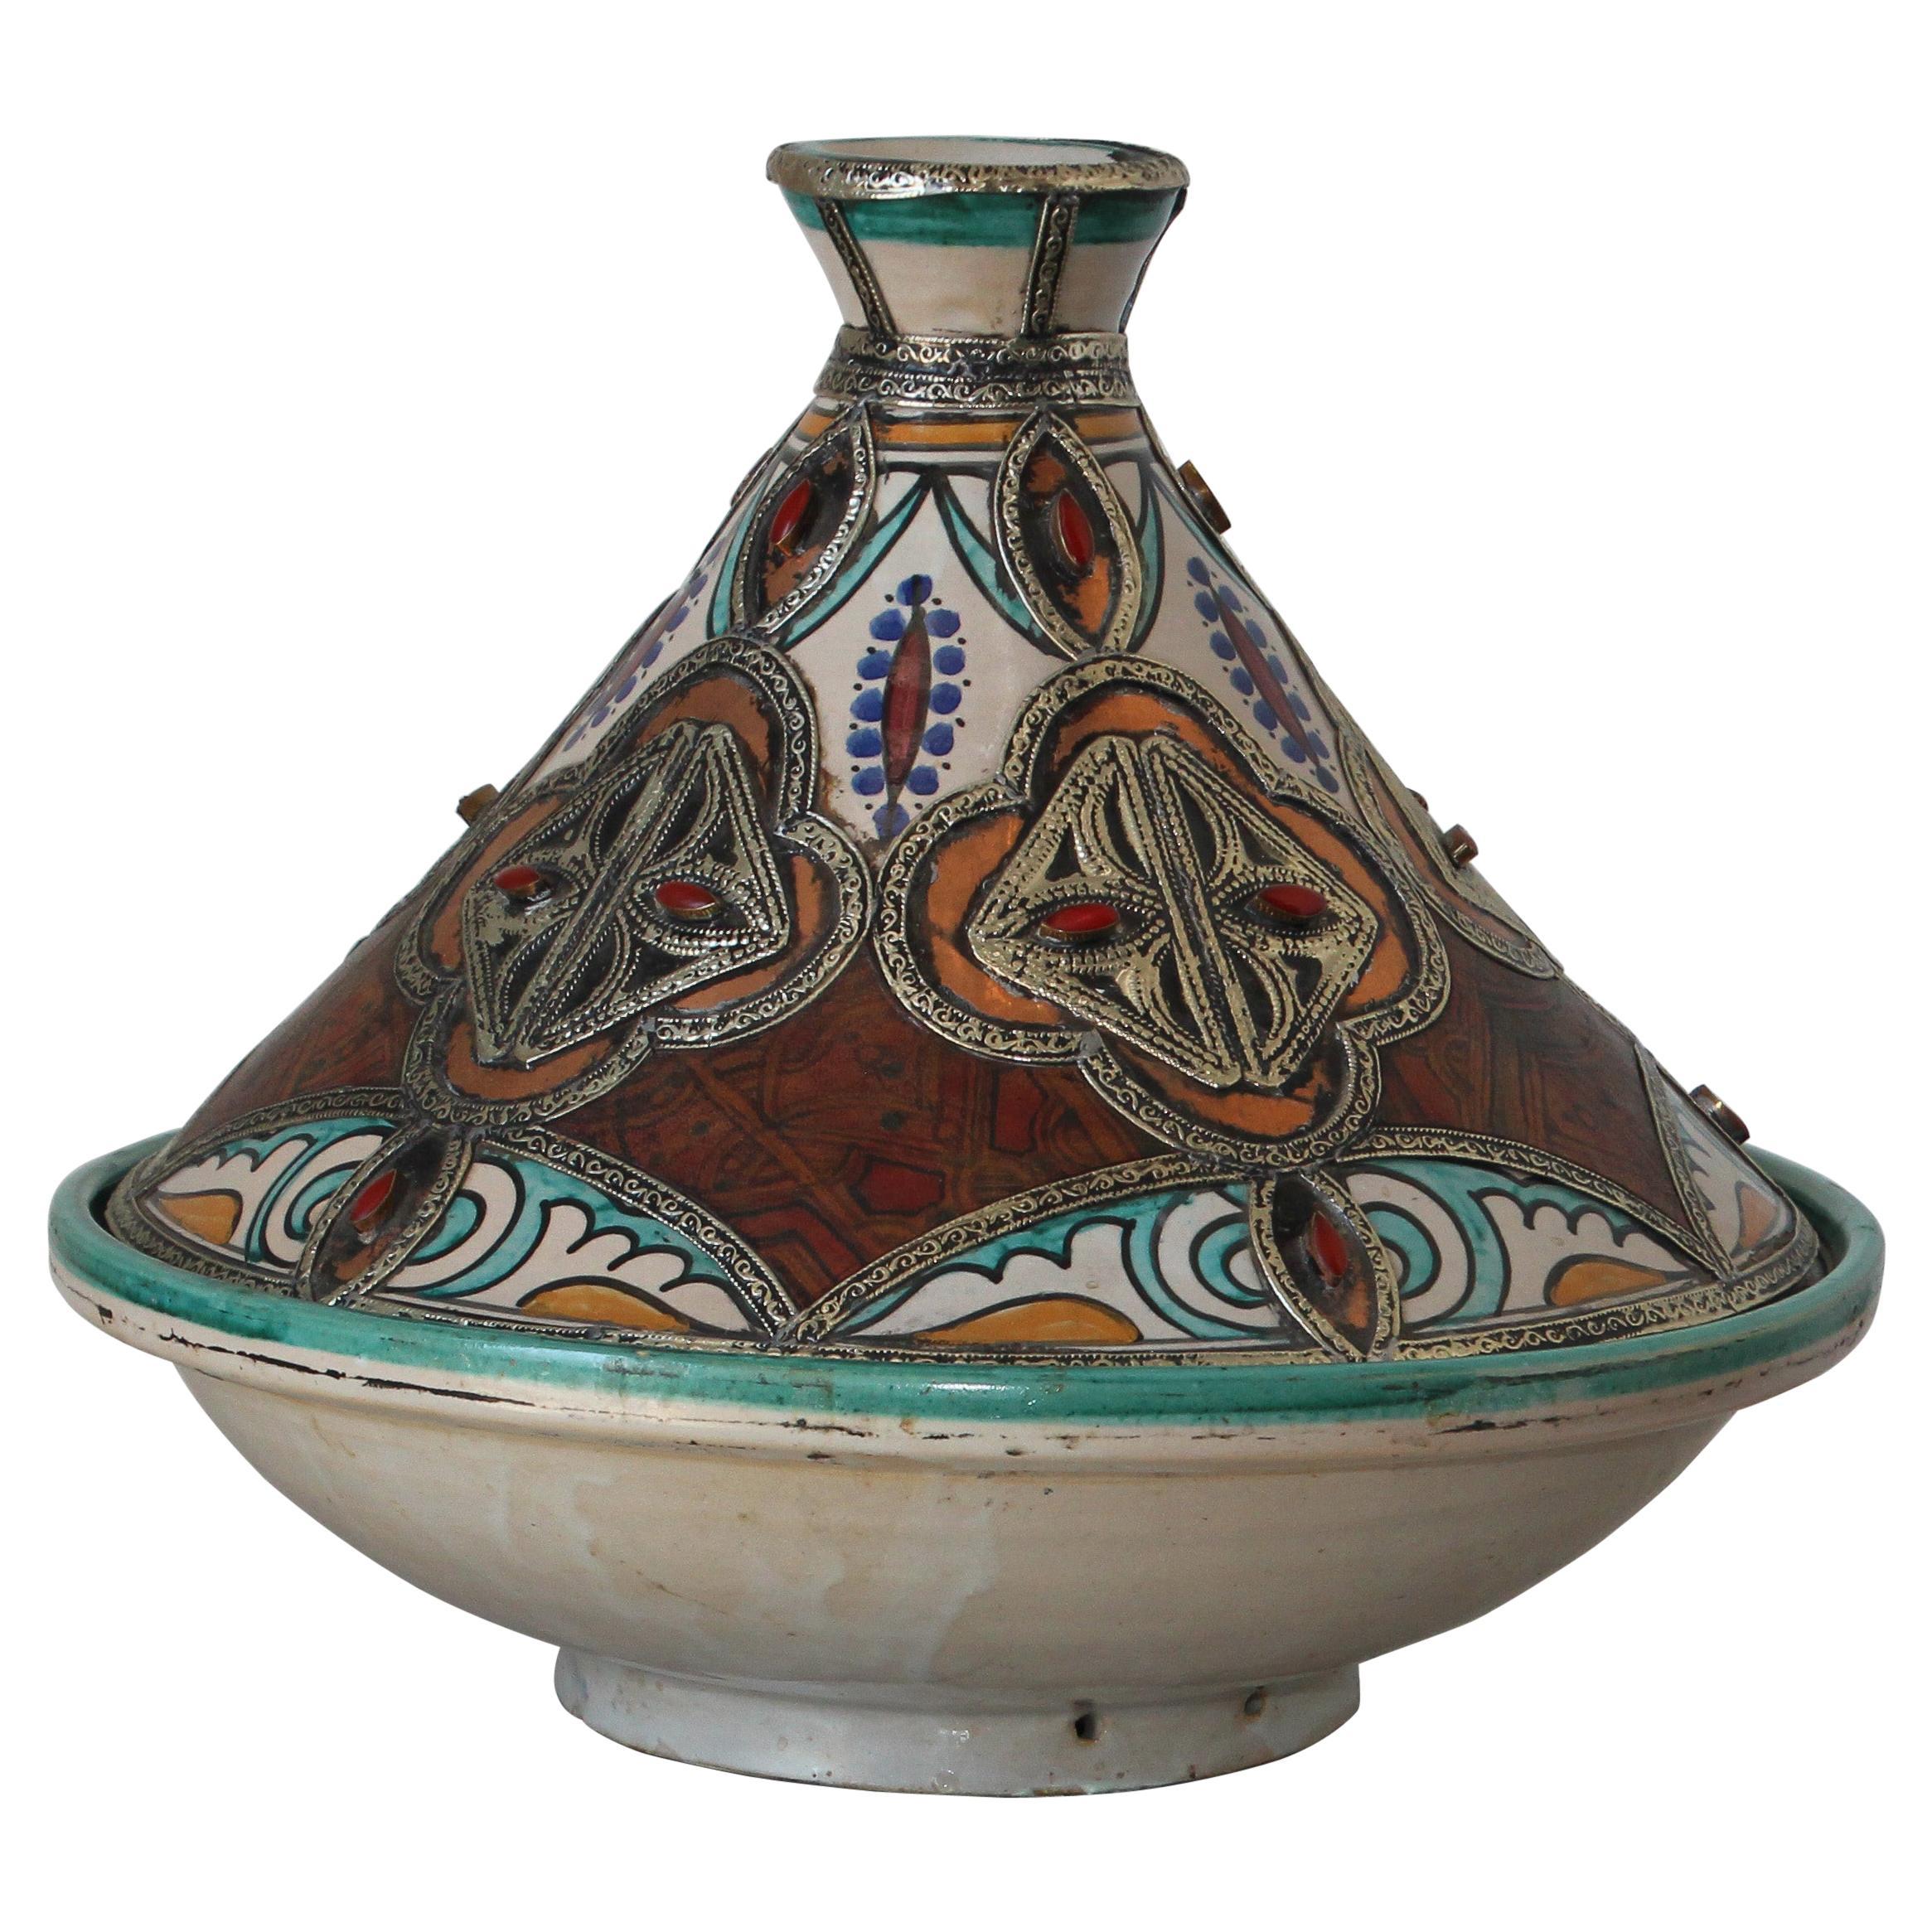 Moroccan Moorish Ceramic Bowl with Lid, Tajine from Fez